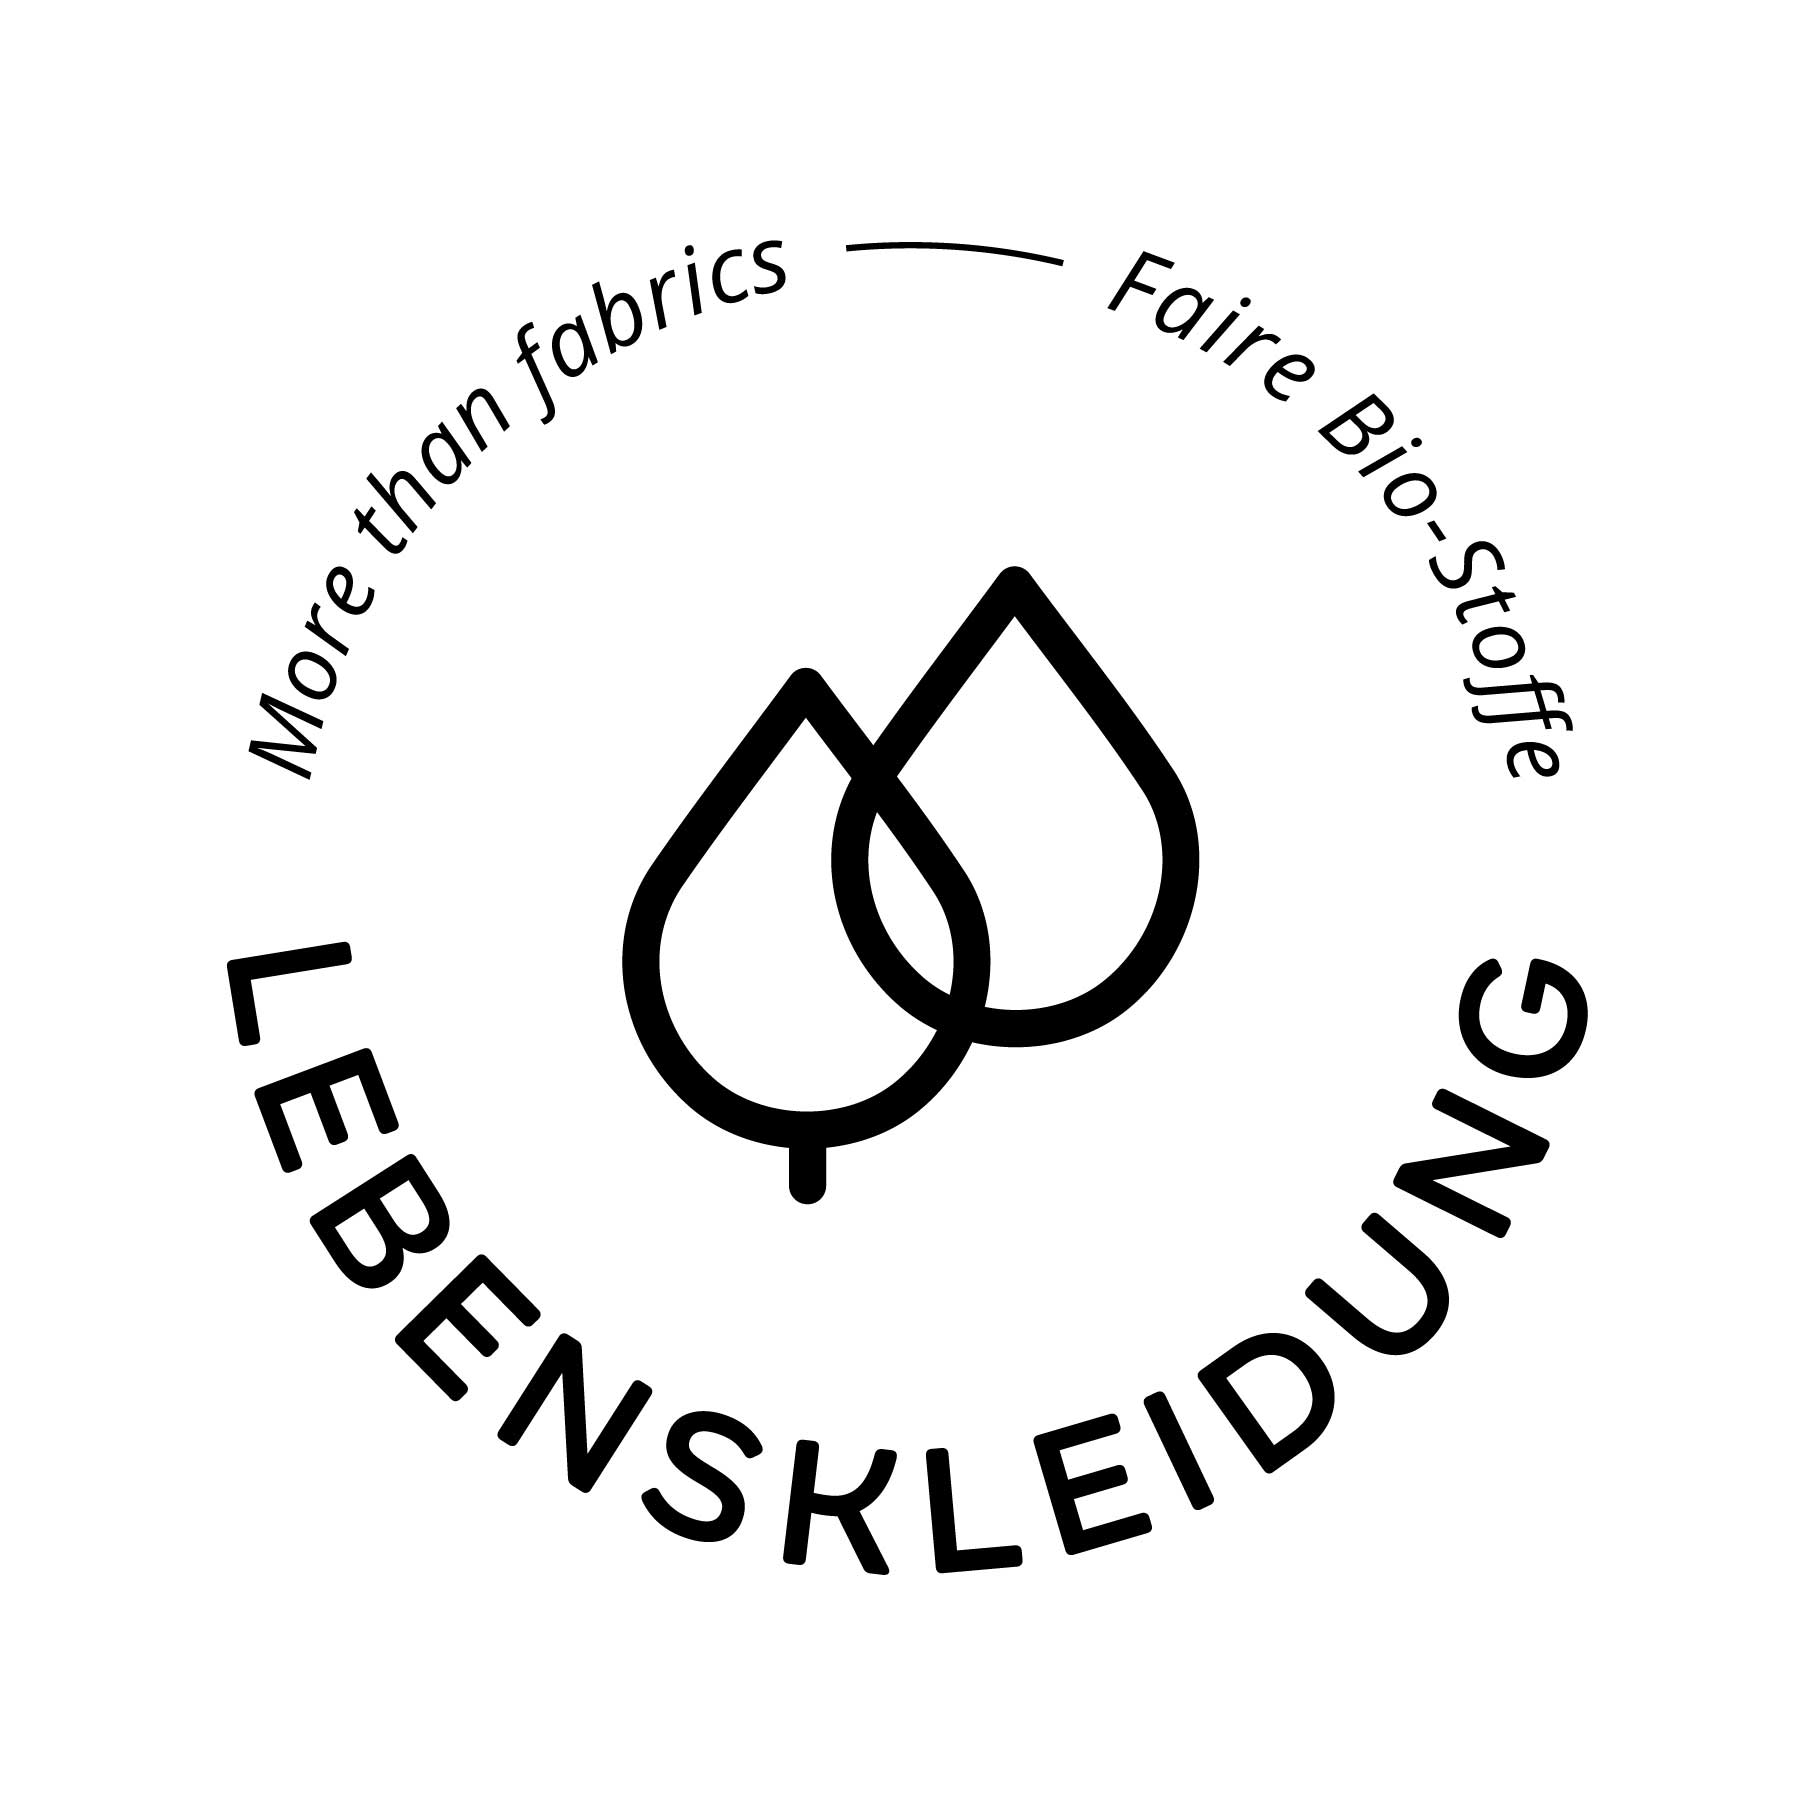 Bio Tissu RIB 2x1 (manchette) - Bordeaux NOUVEAU-1